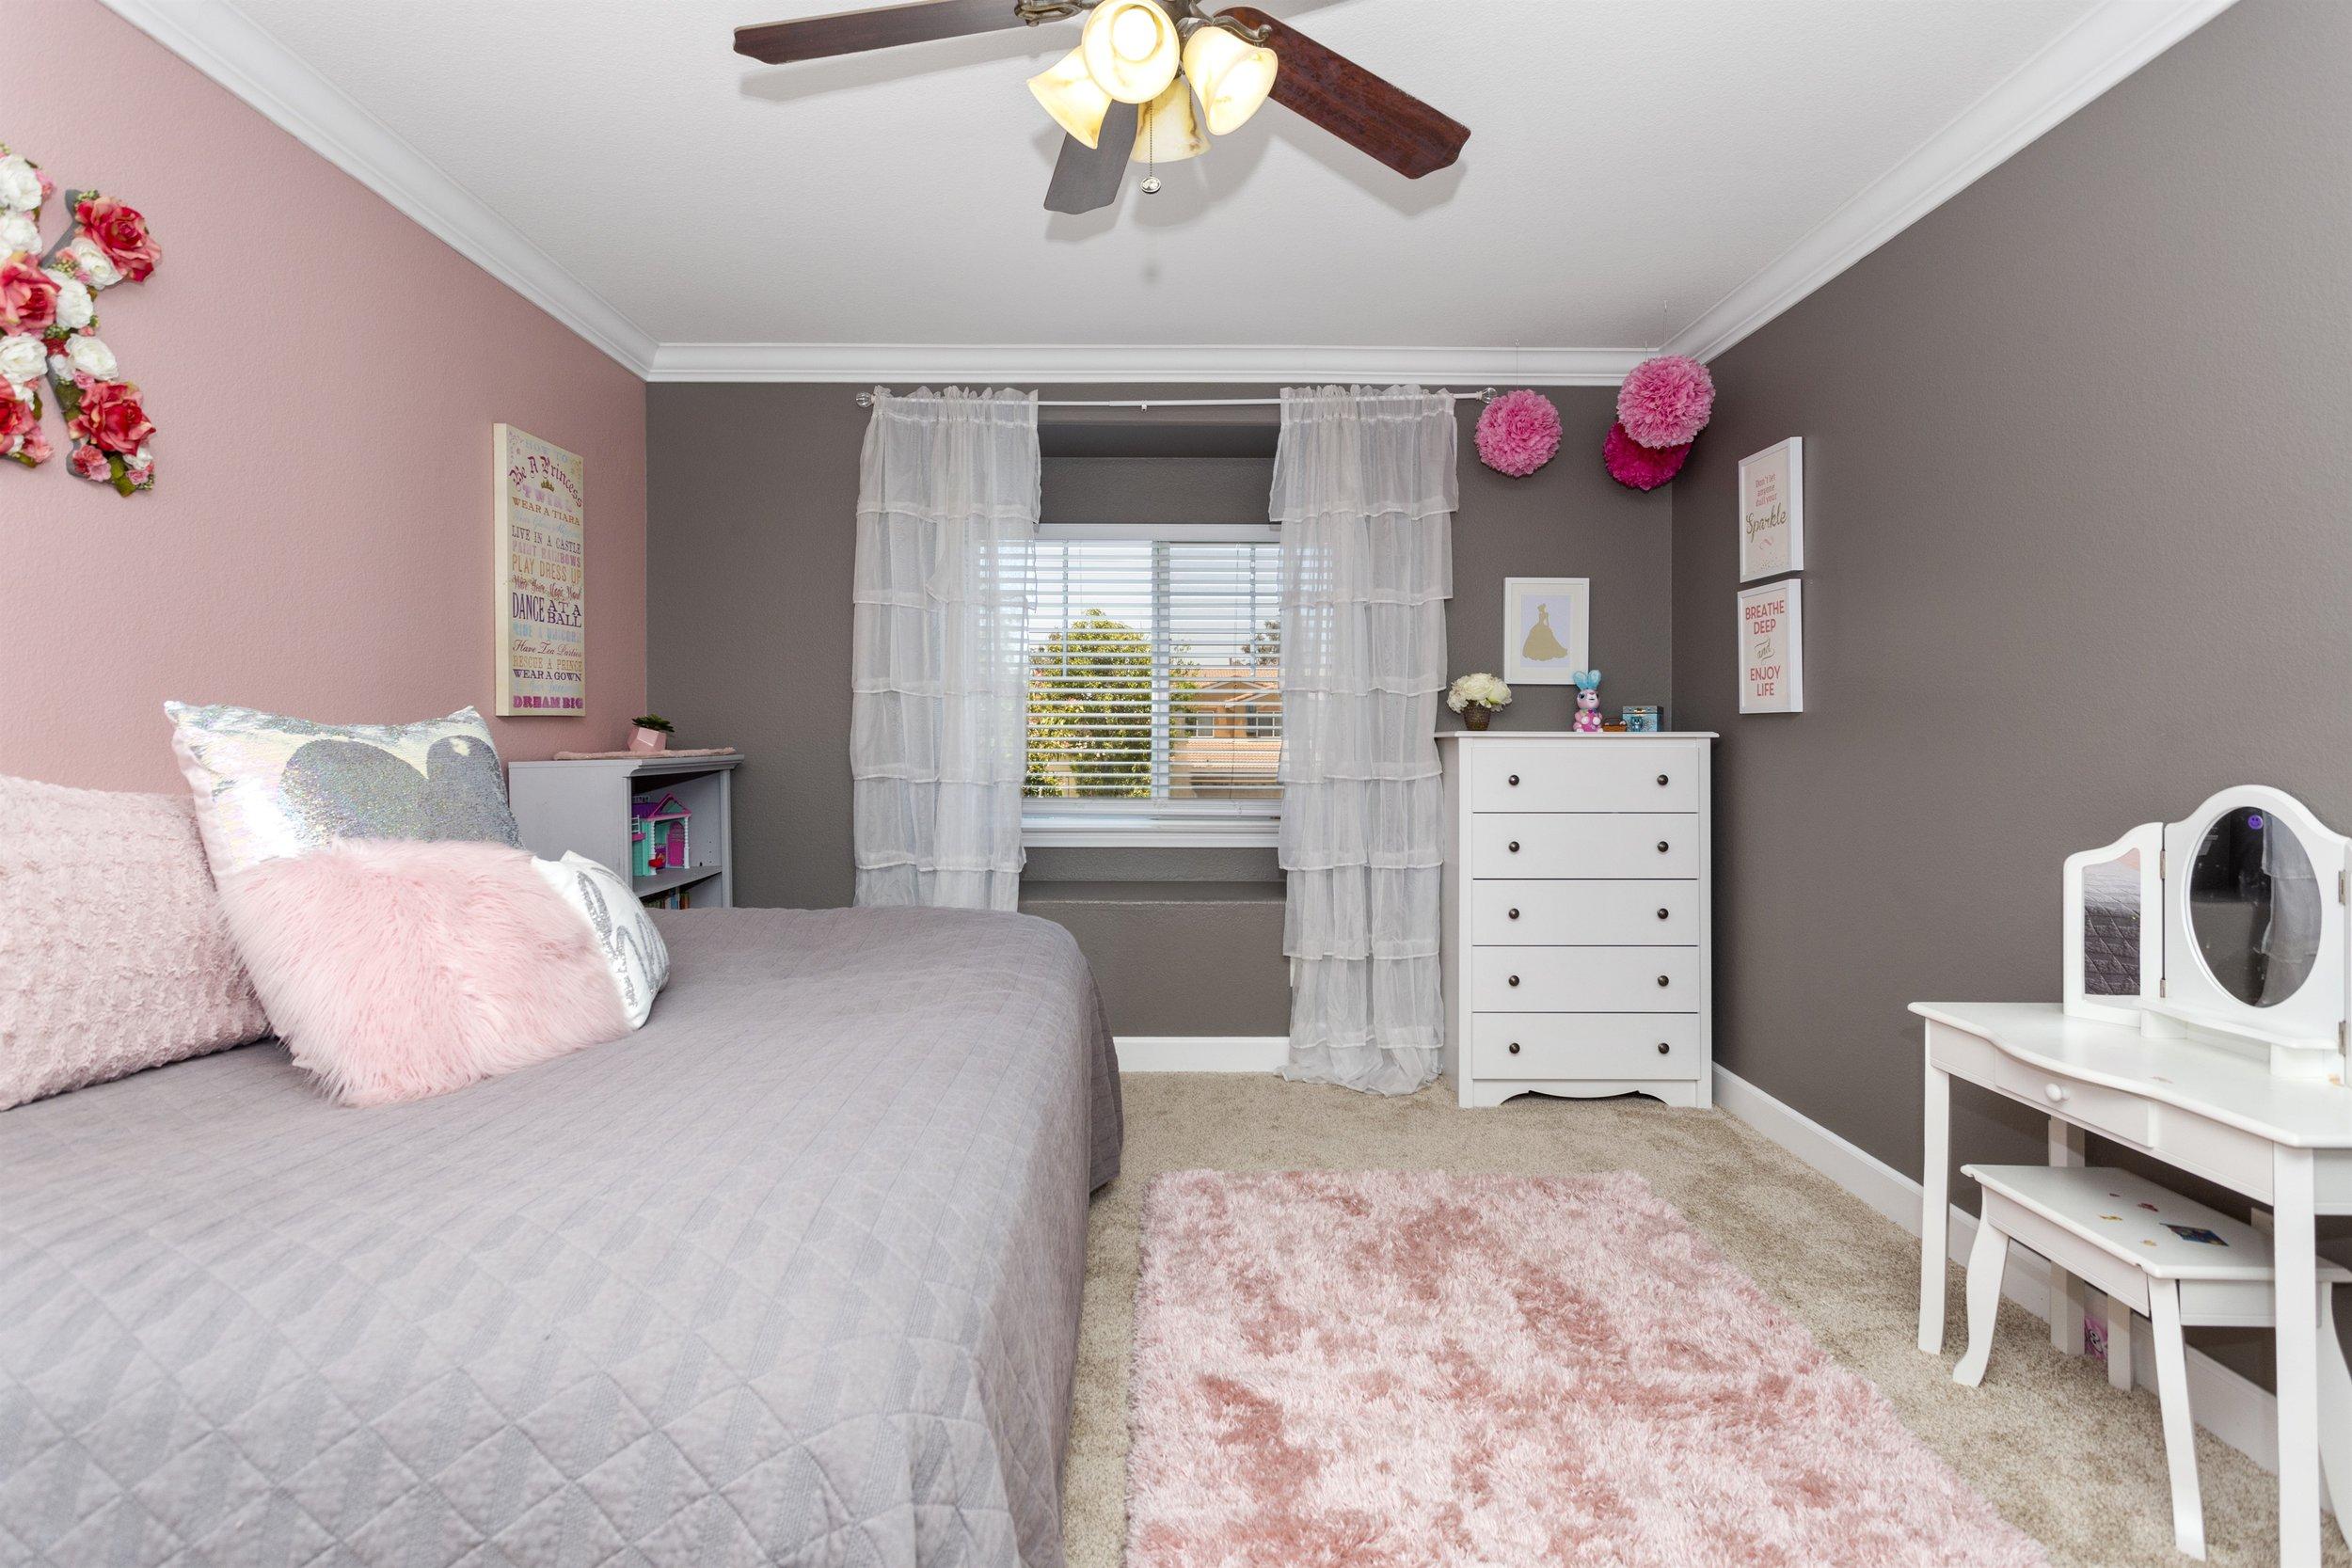 037_Bedroom.jpg